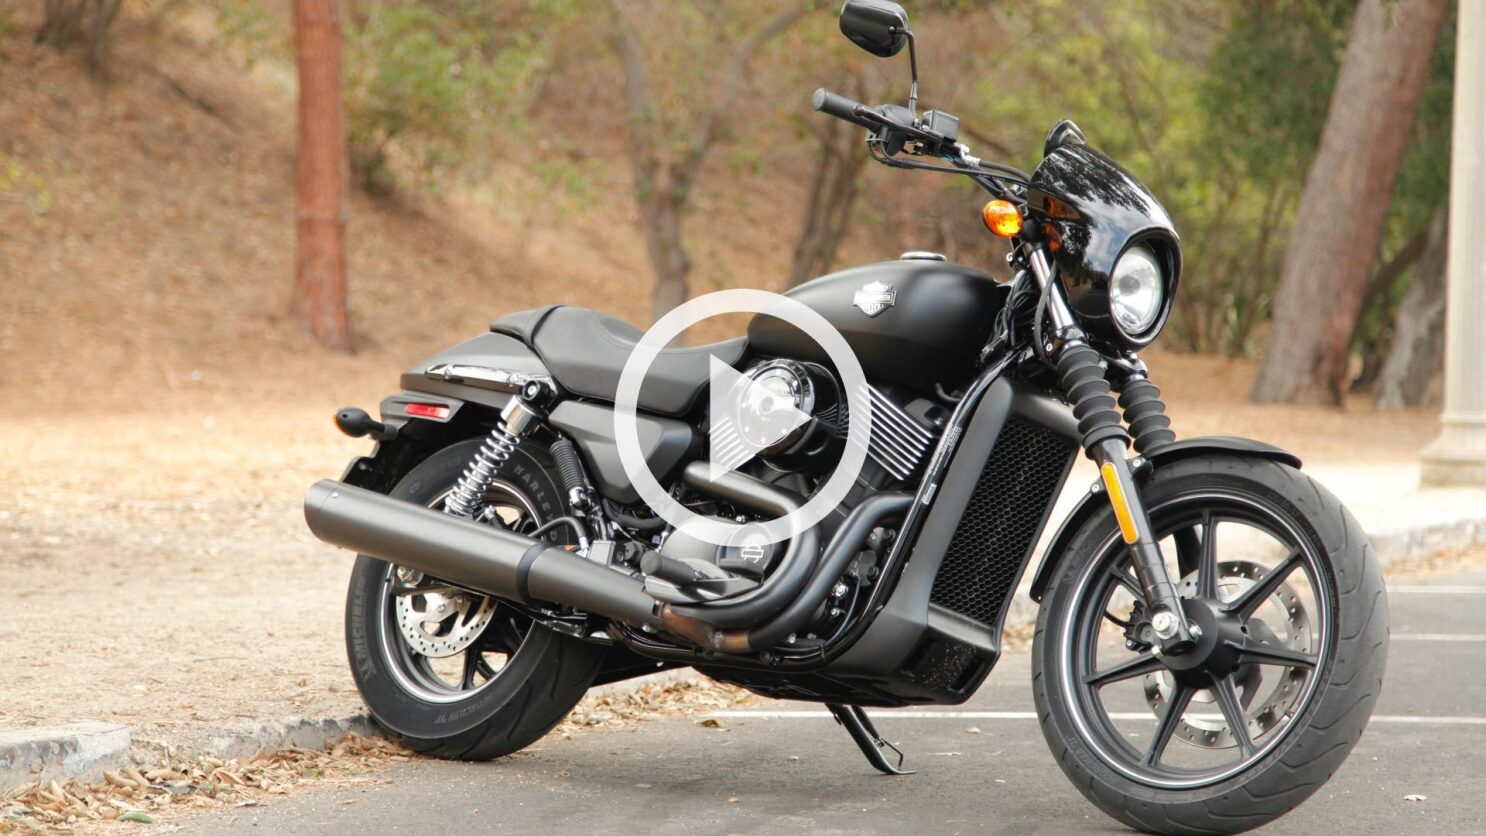 First Times Ride: 2015 Harley-Davidson Street 750 - Los